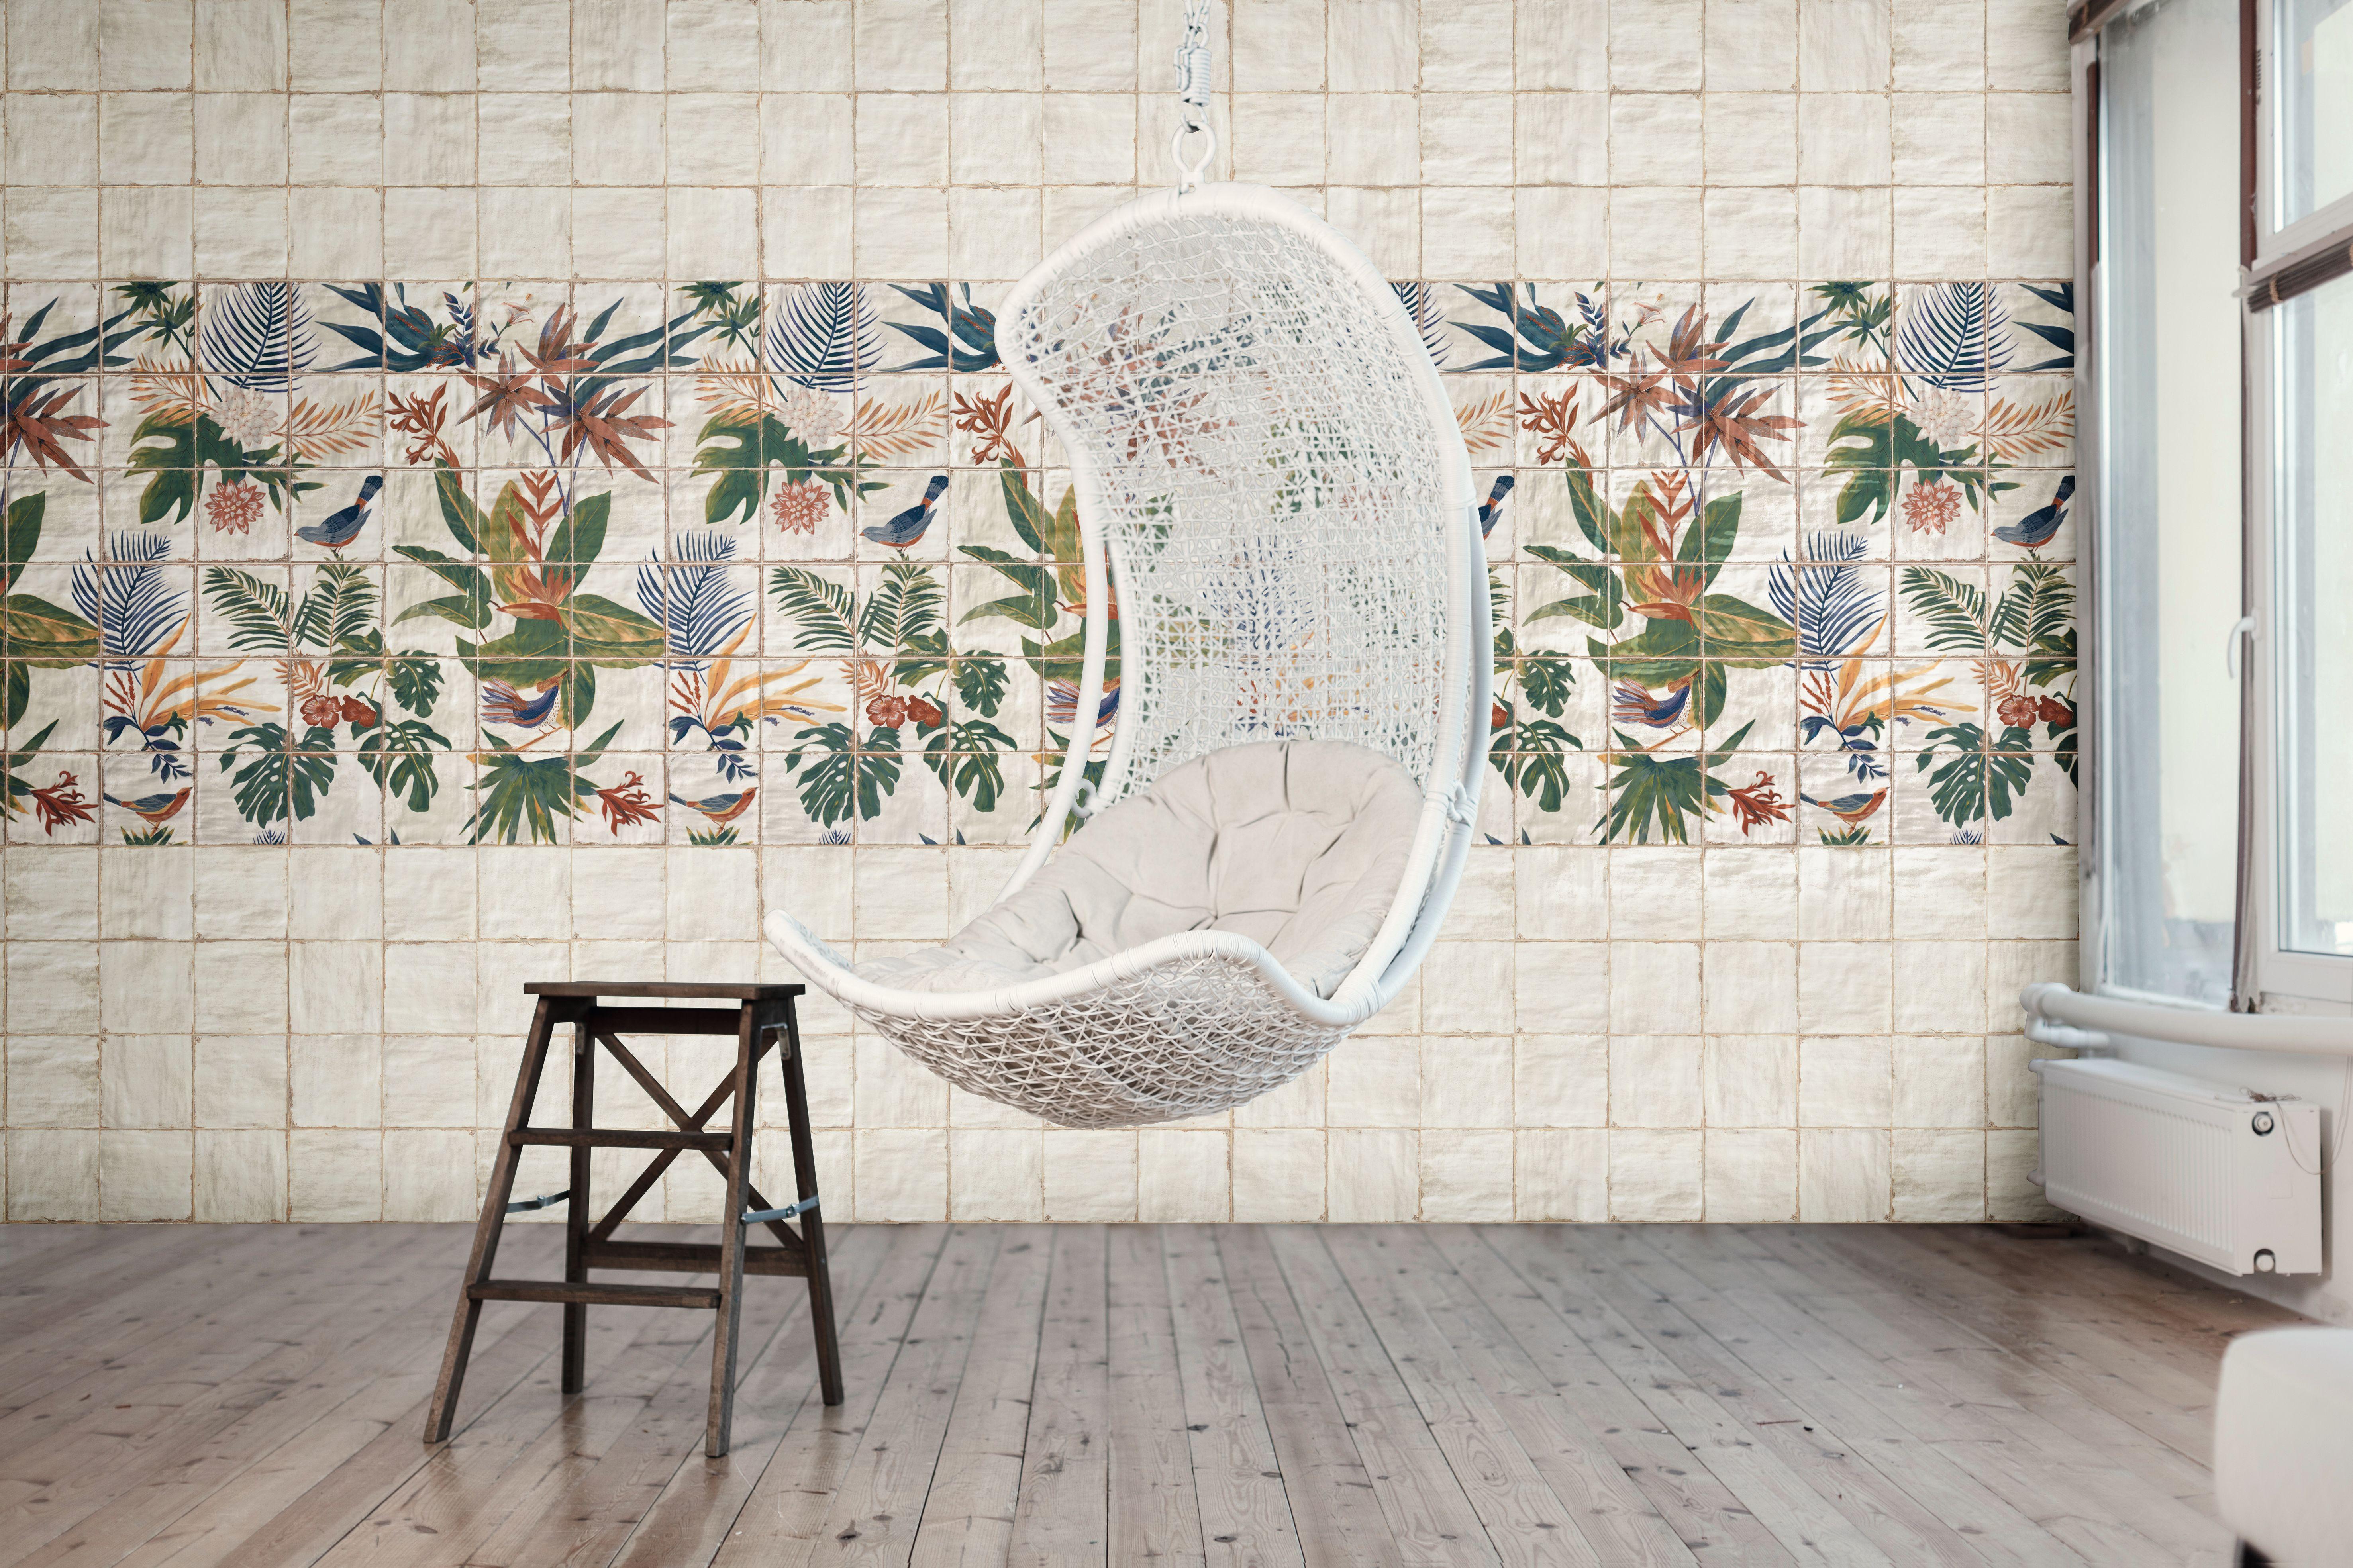 Livorno Blanco y Mural Sonata by Mainzu